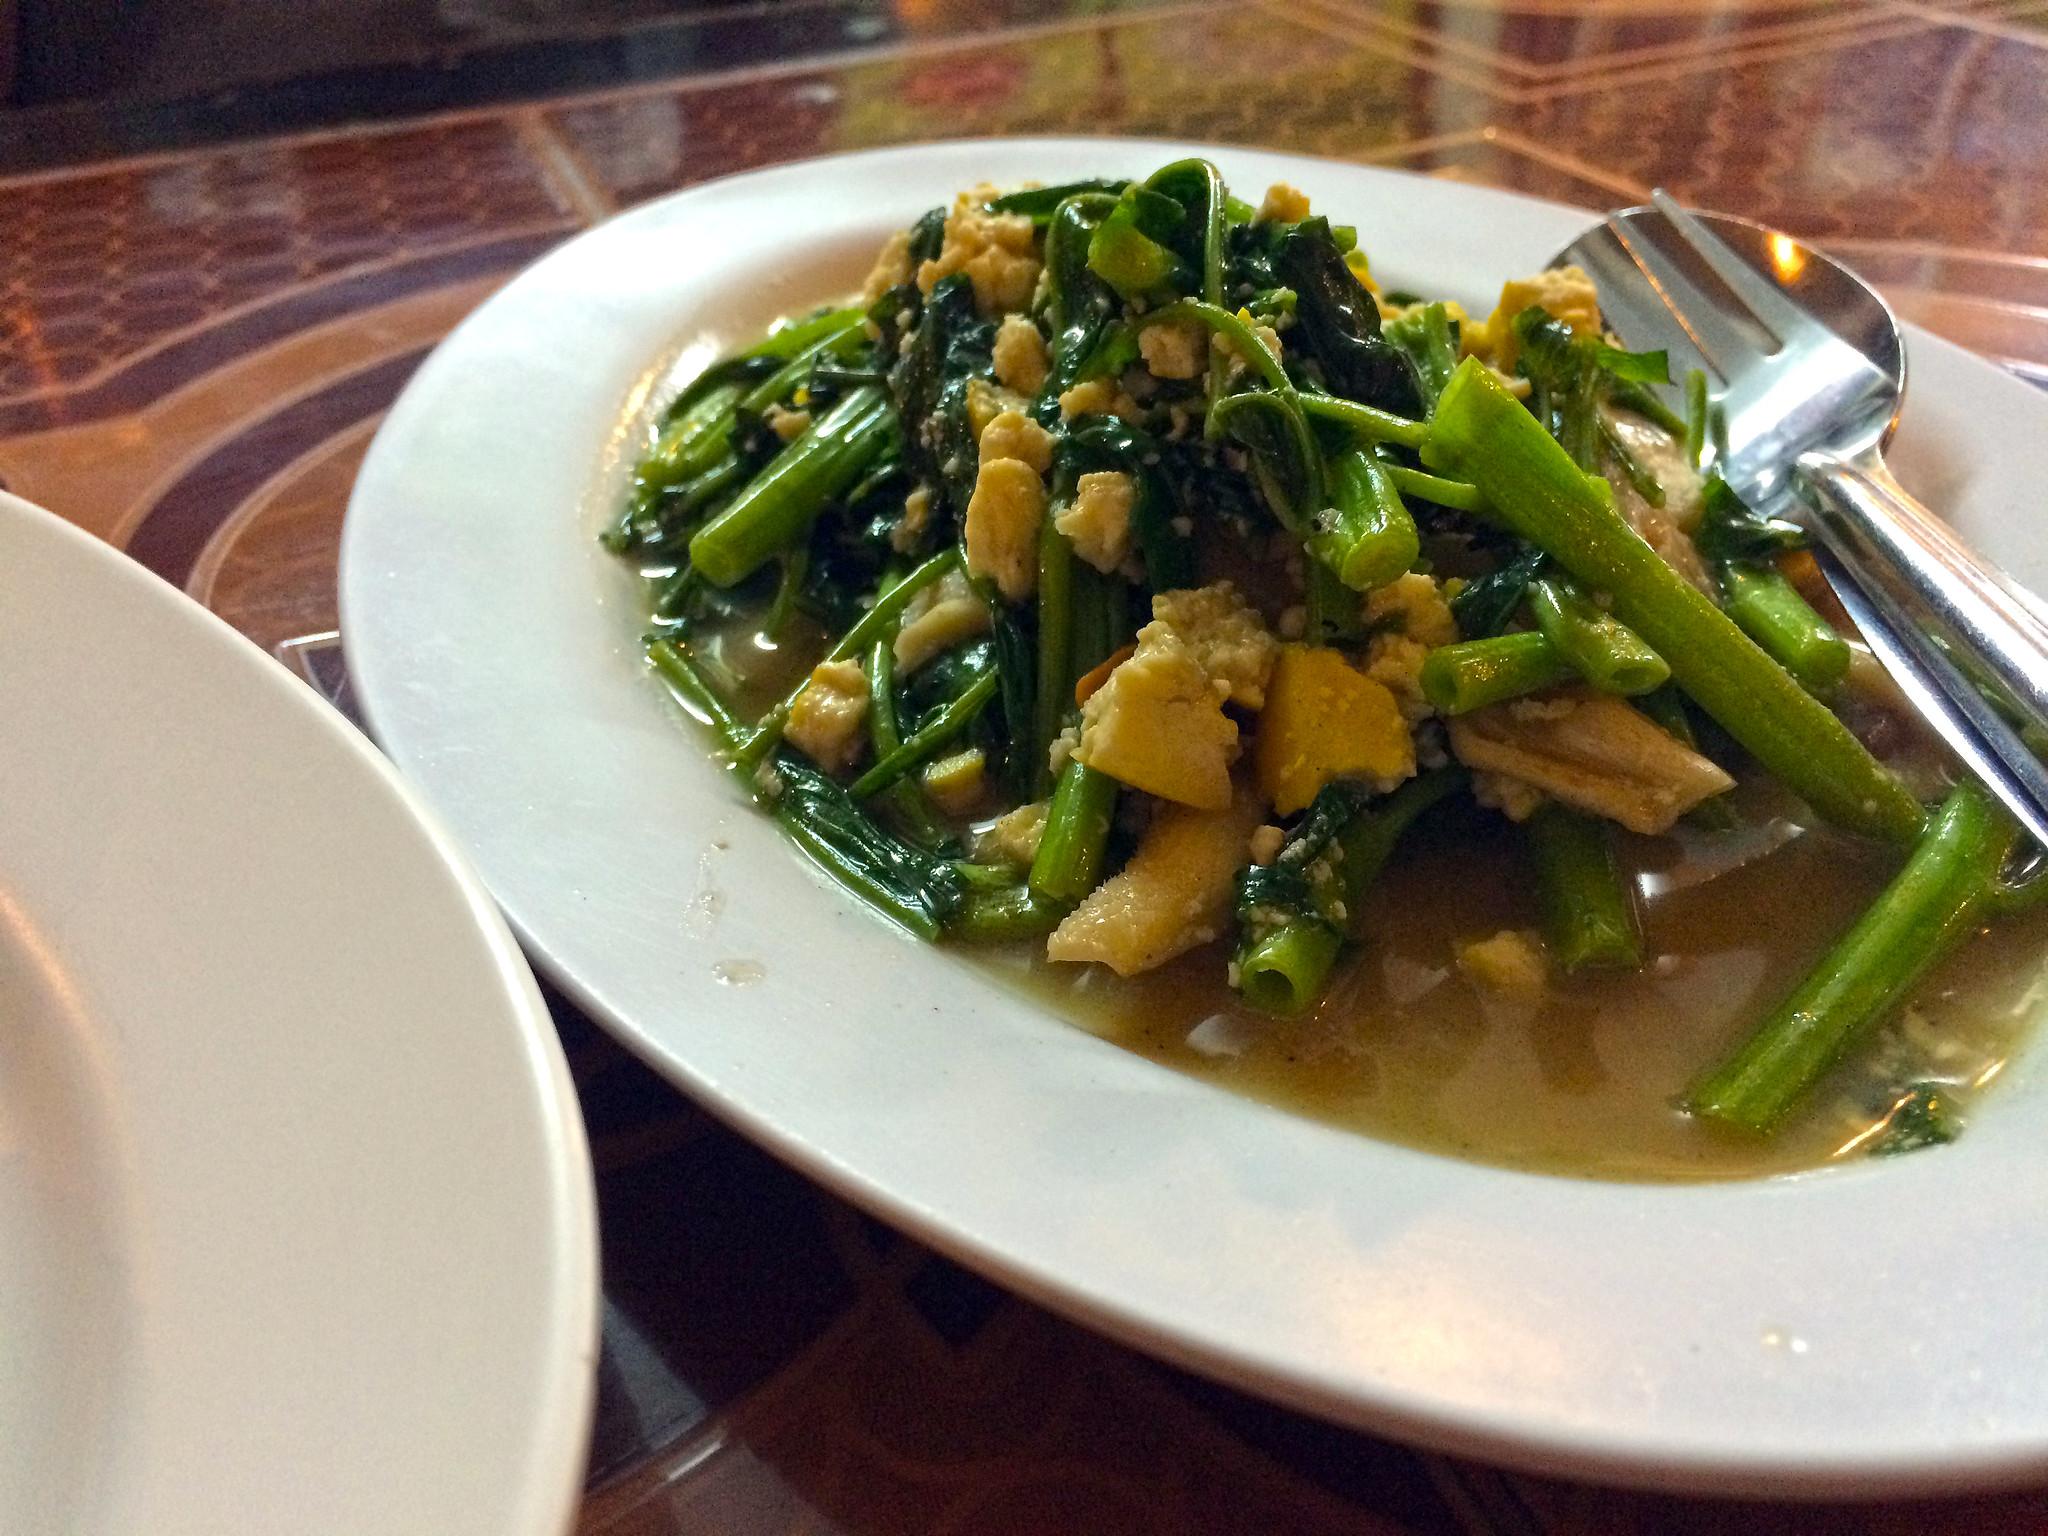 Stir-fried morning glory with mushrooms and tofu